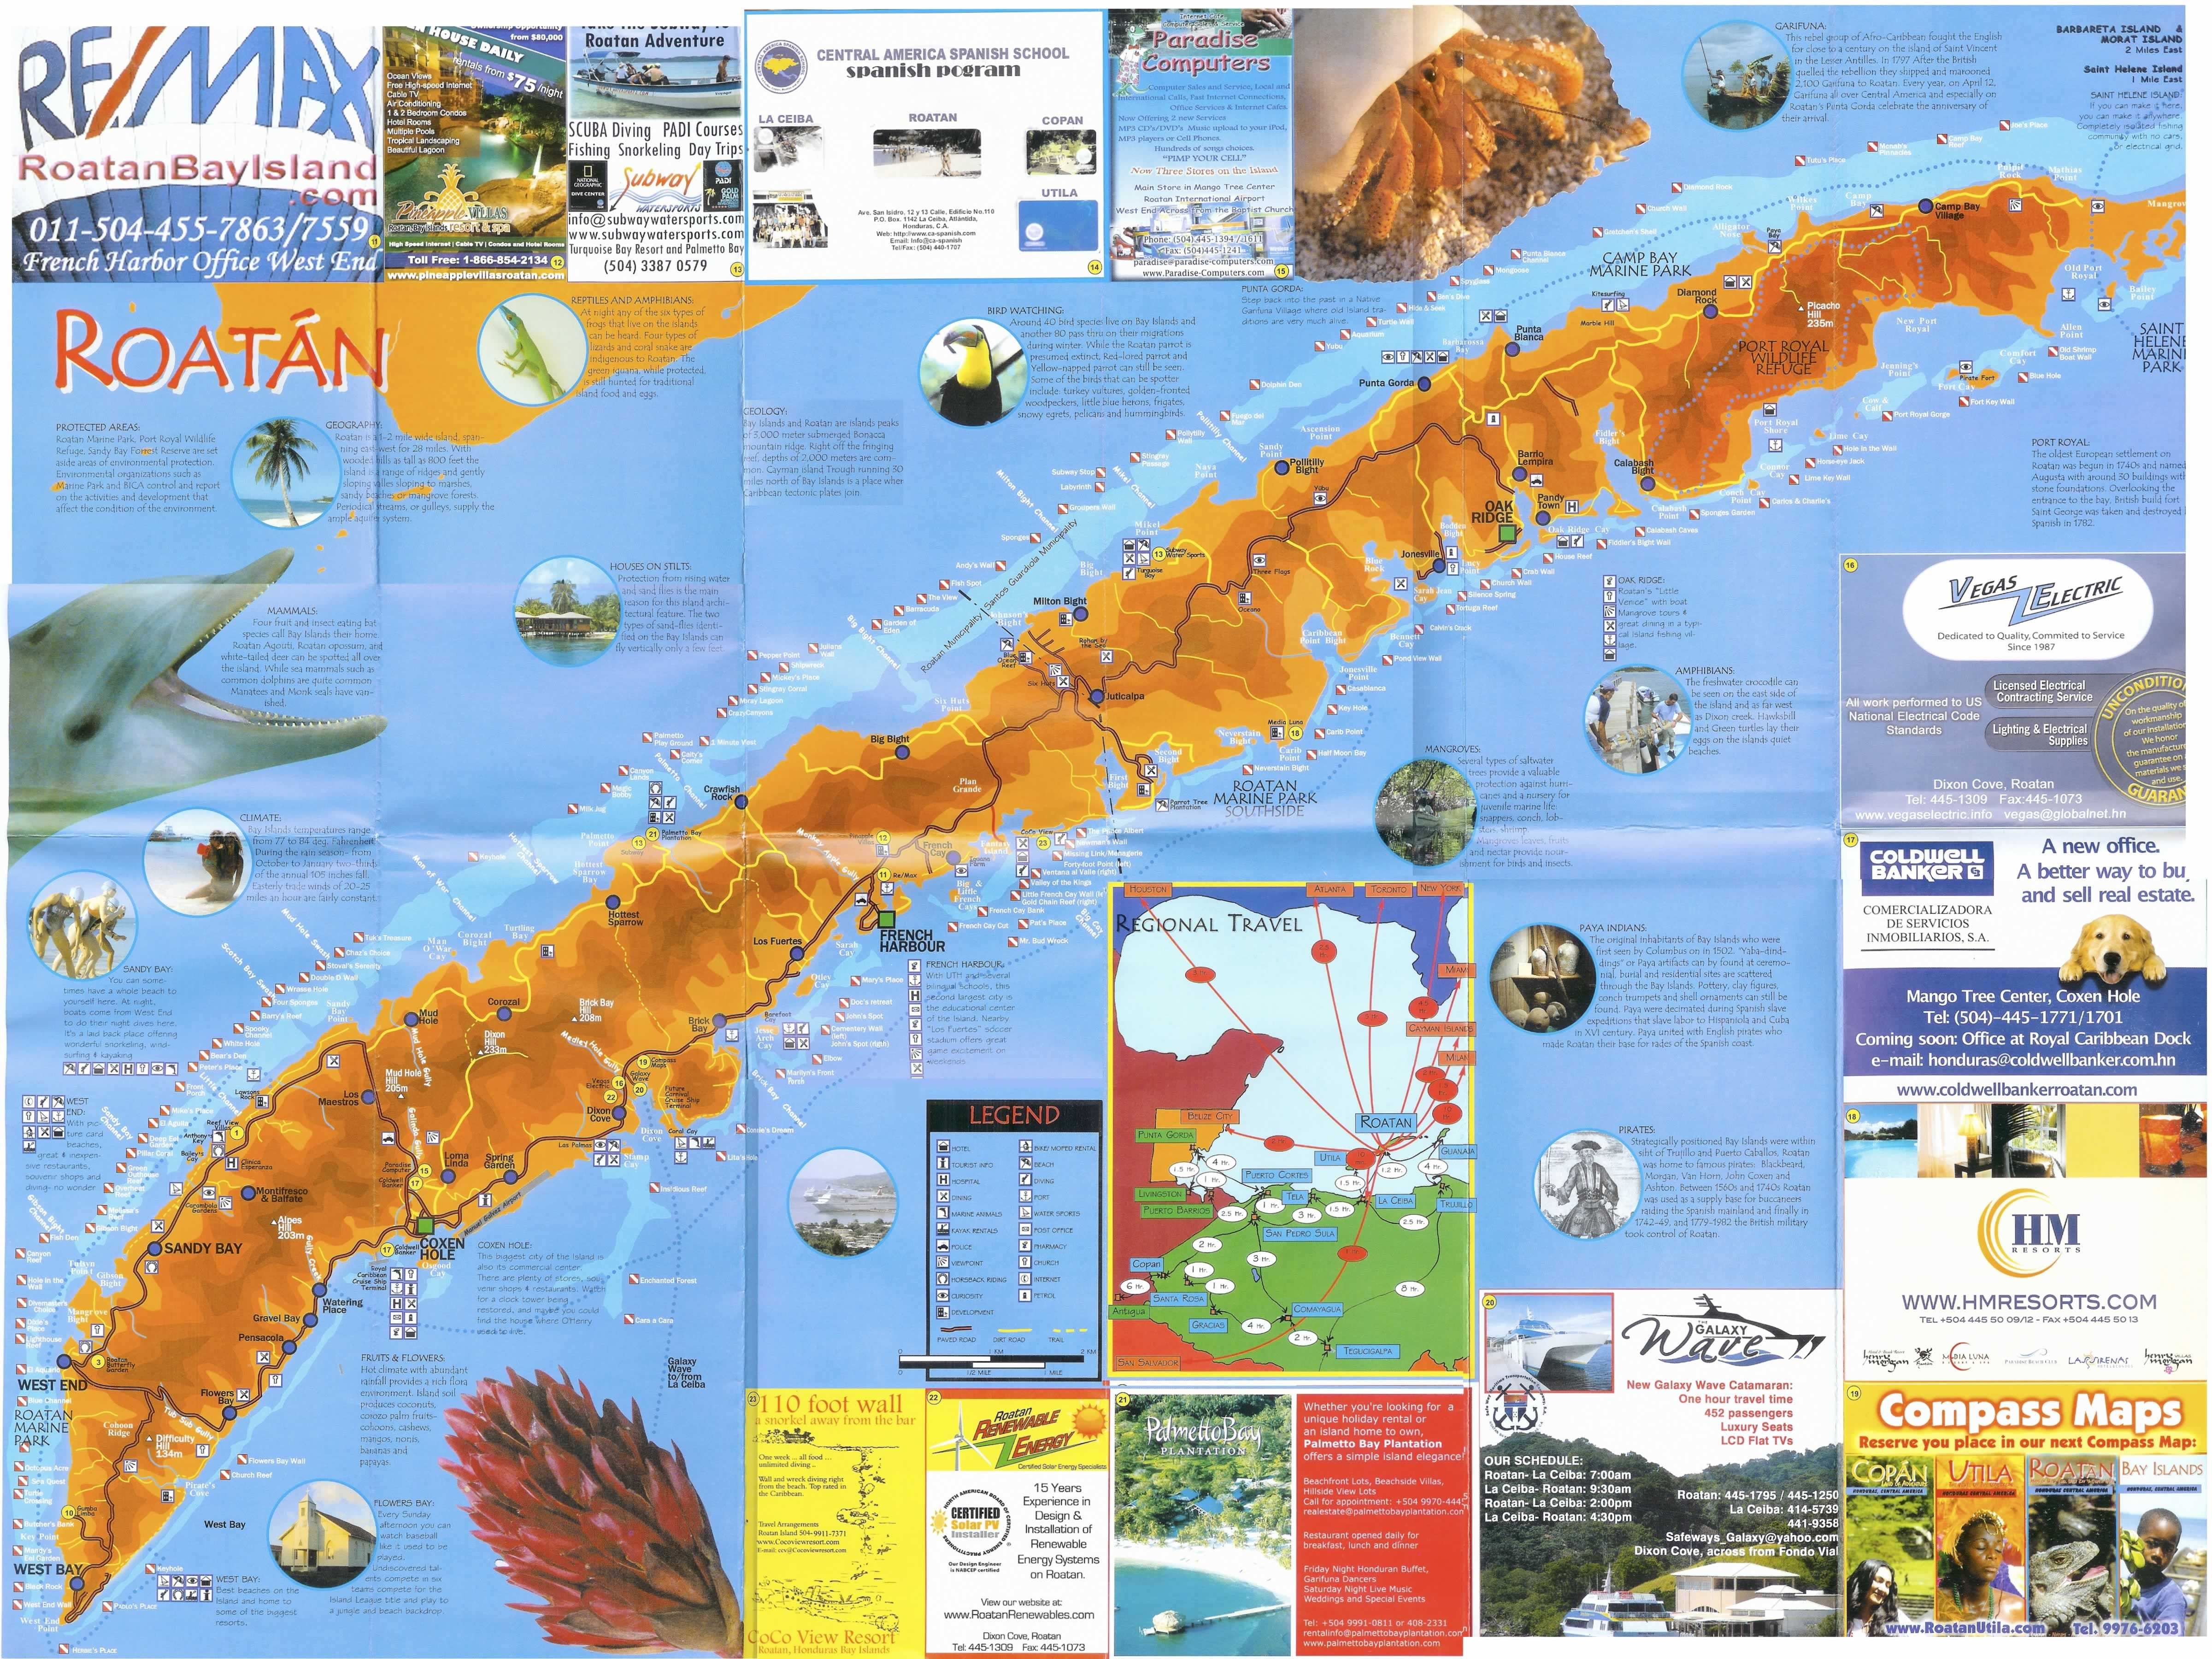 Roatan blue hole google search roatan hondorus - Roatan dive sites ...